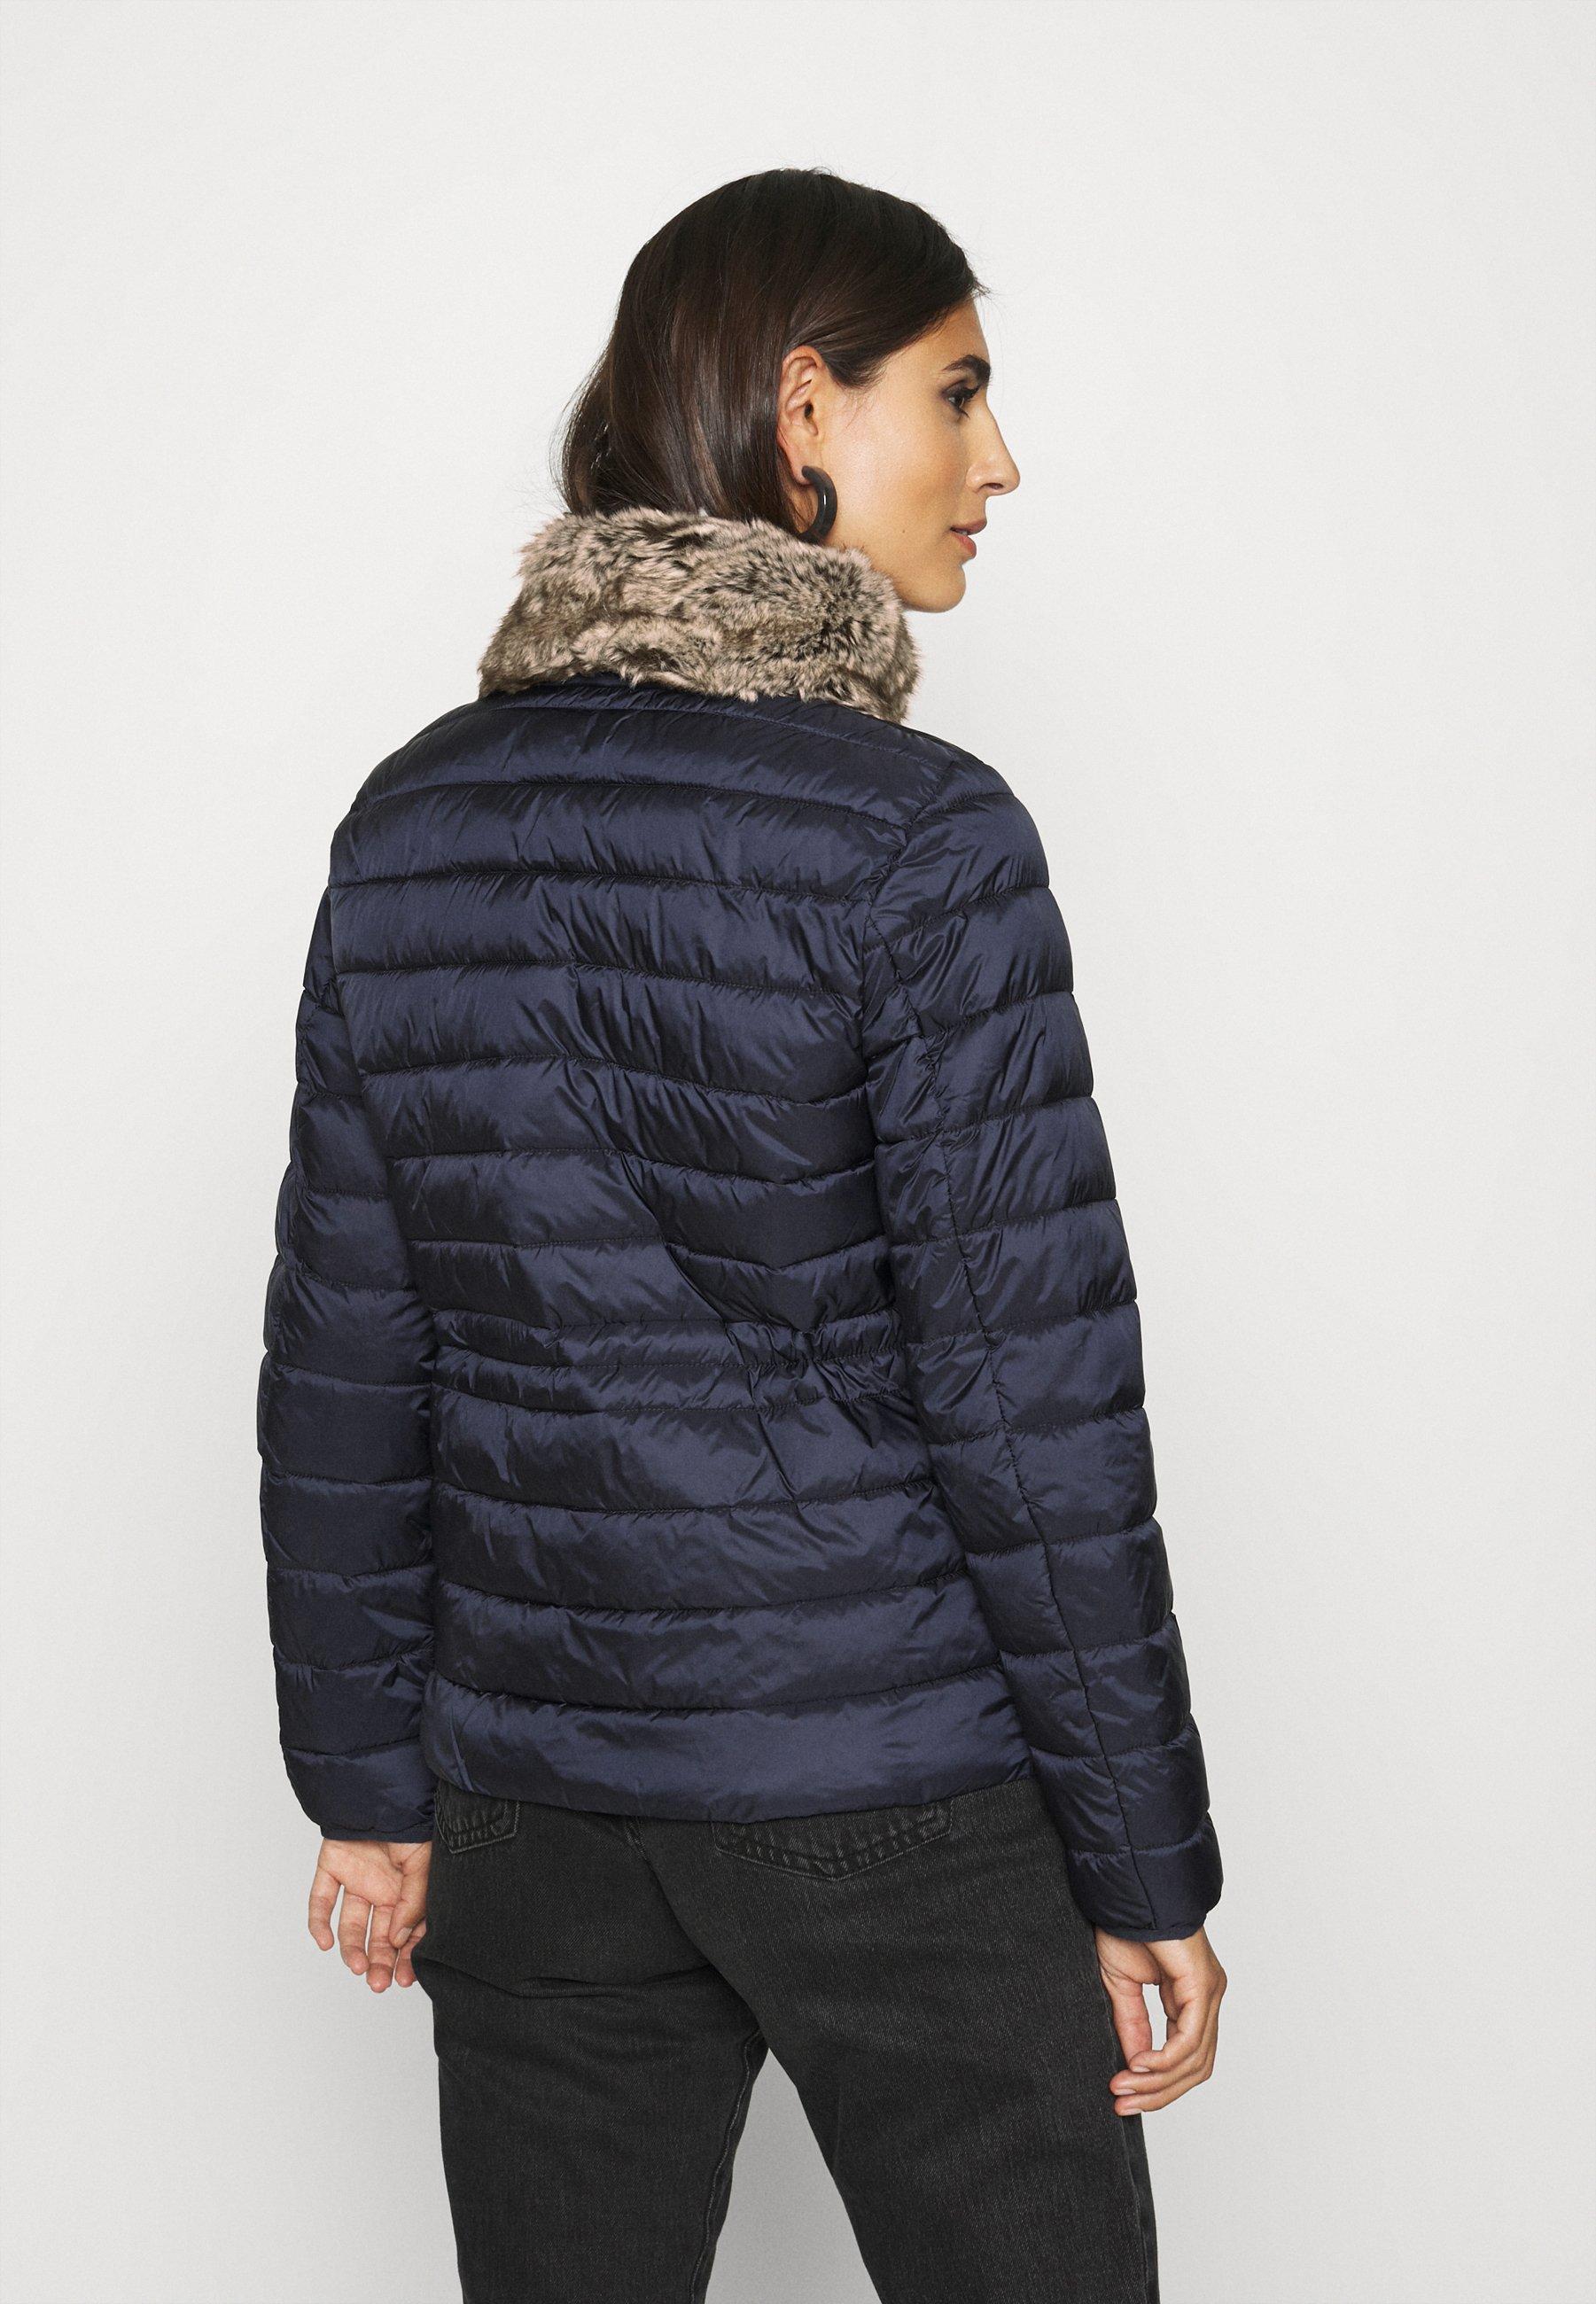 2020 New Women's Clothing Esprit Collection THINSU Light jacket navy dWfGi6ezG